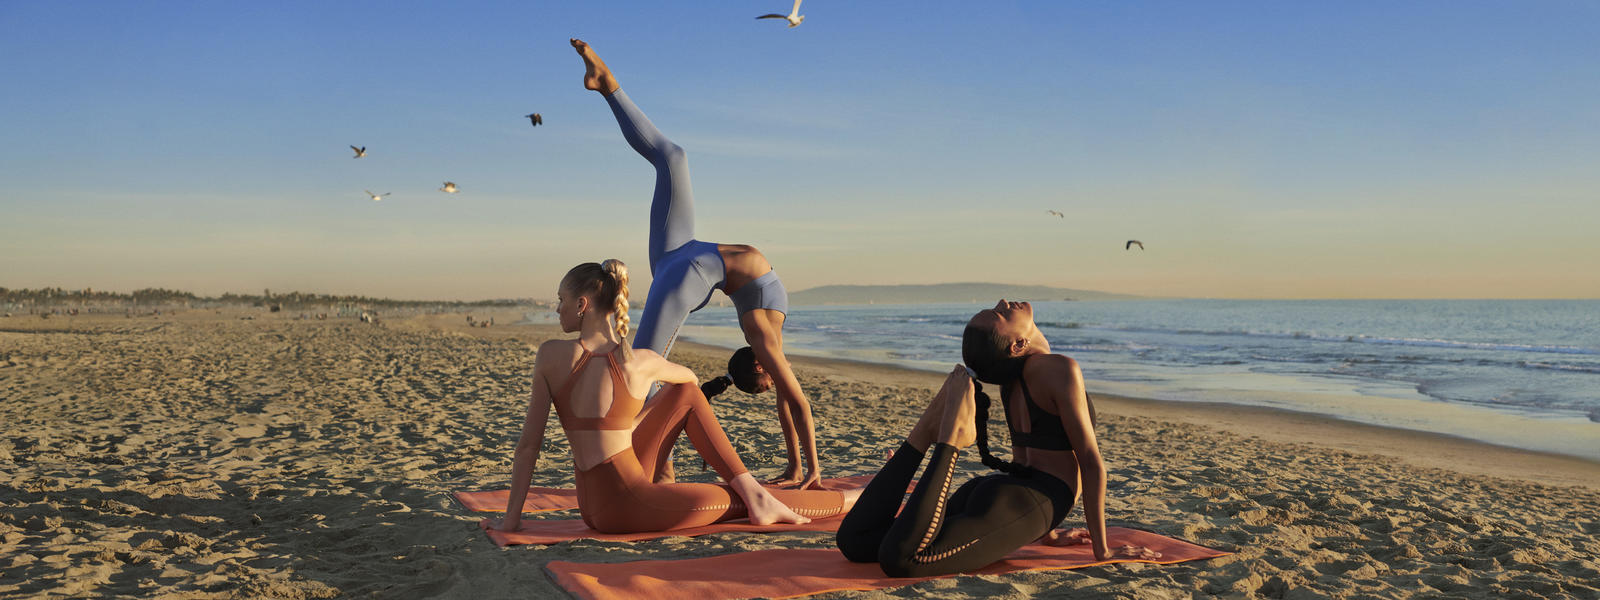 SU19_Nike_Yoga_Collection6_native_1600.jpg